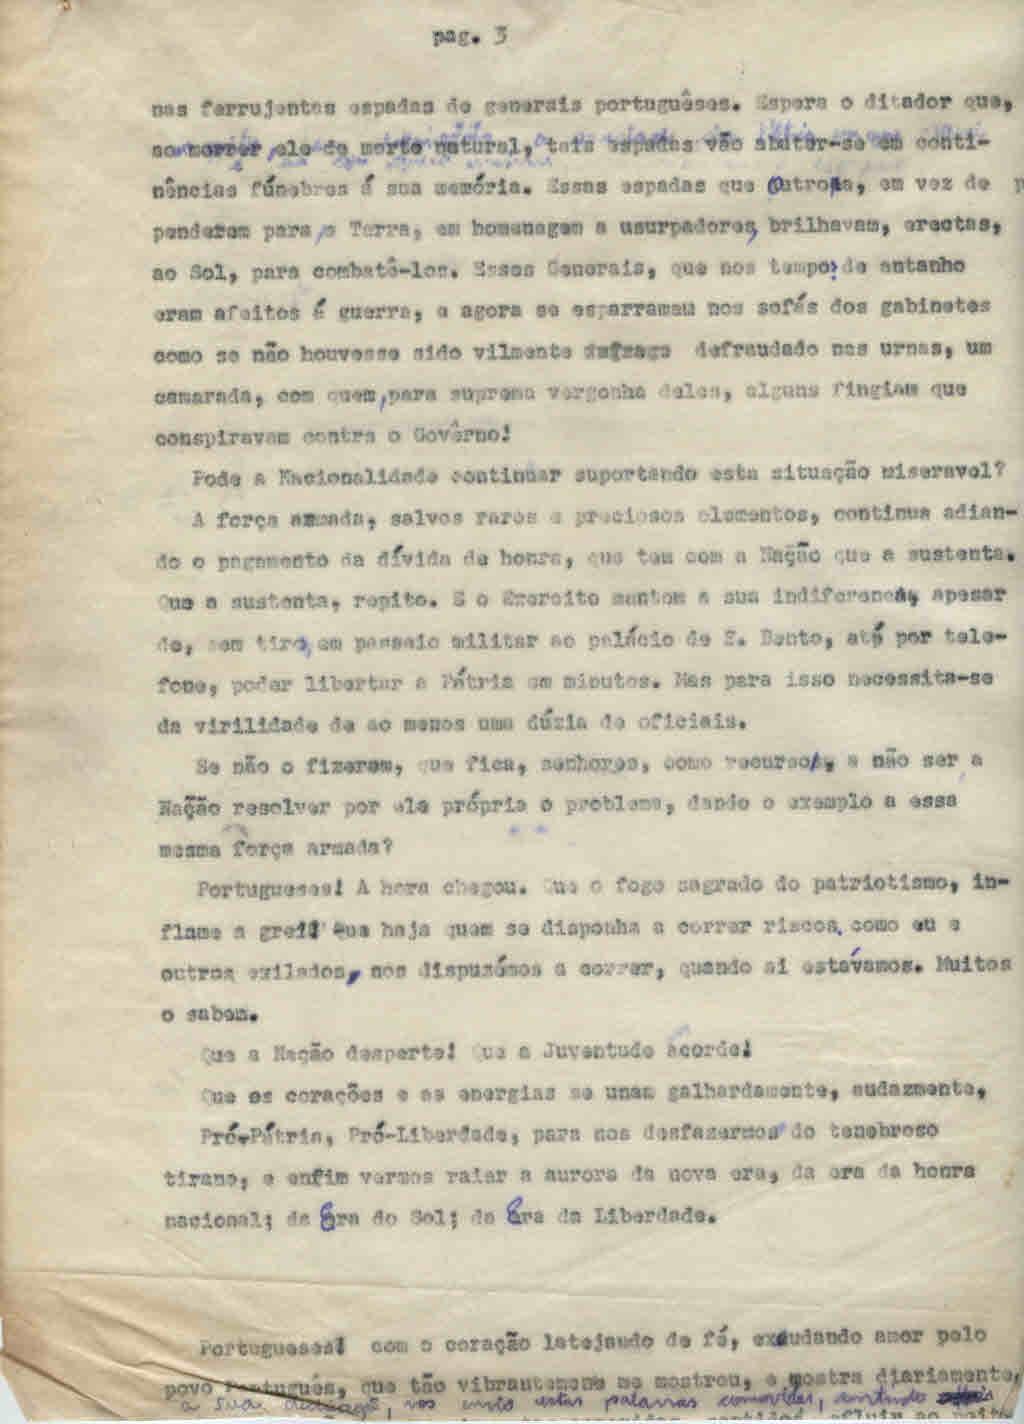 18_MARÇO1960 (3)